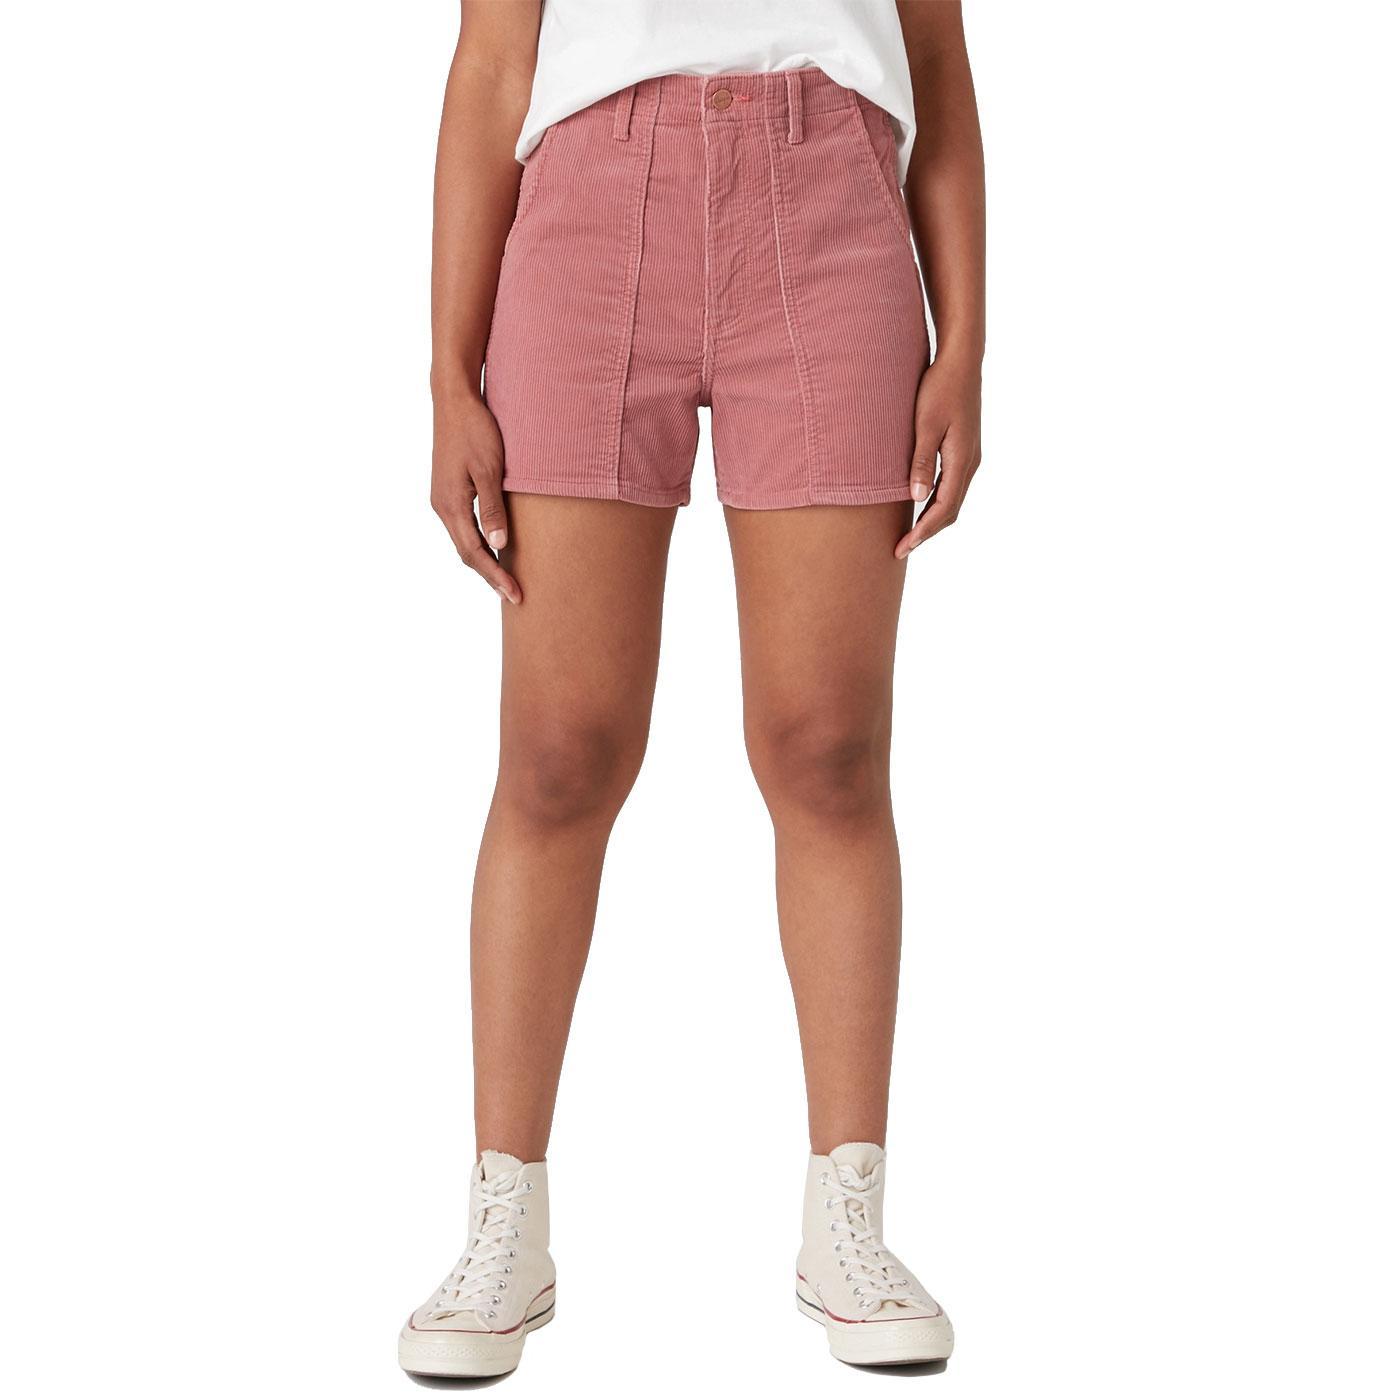 WRANGLER Women's Cord Mom Shorts DUSTY PINK